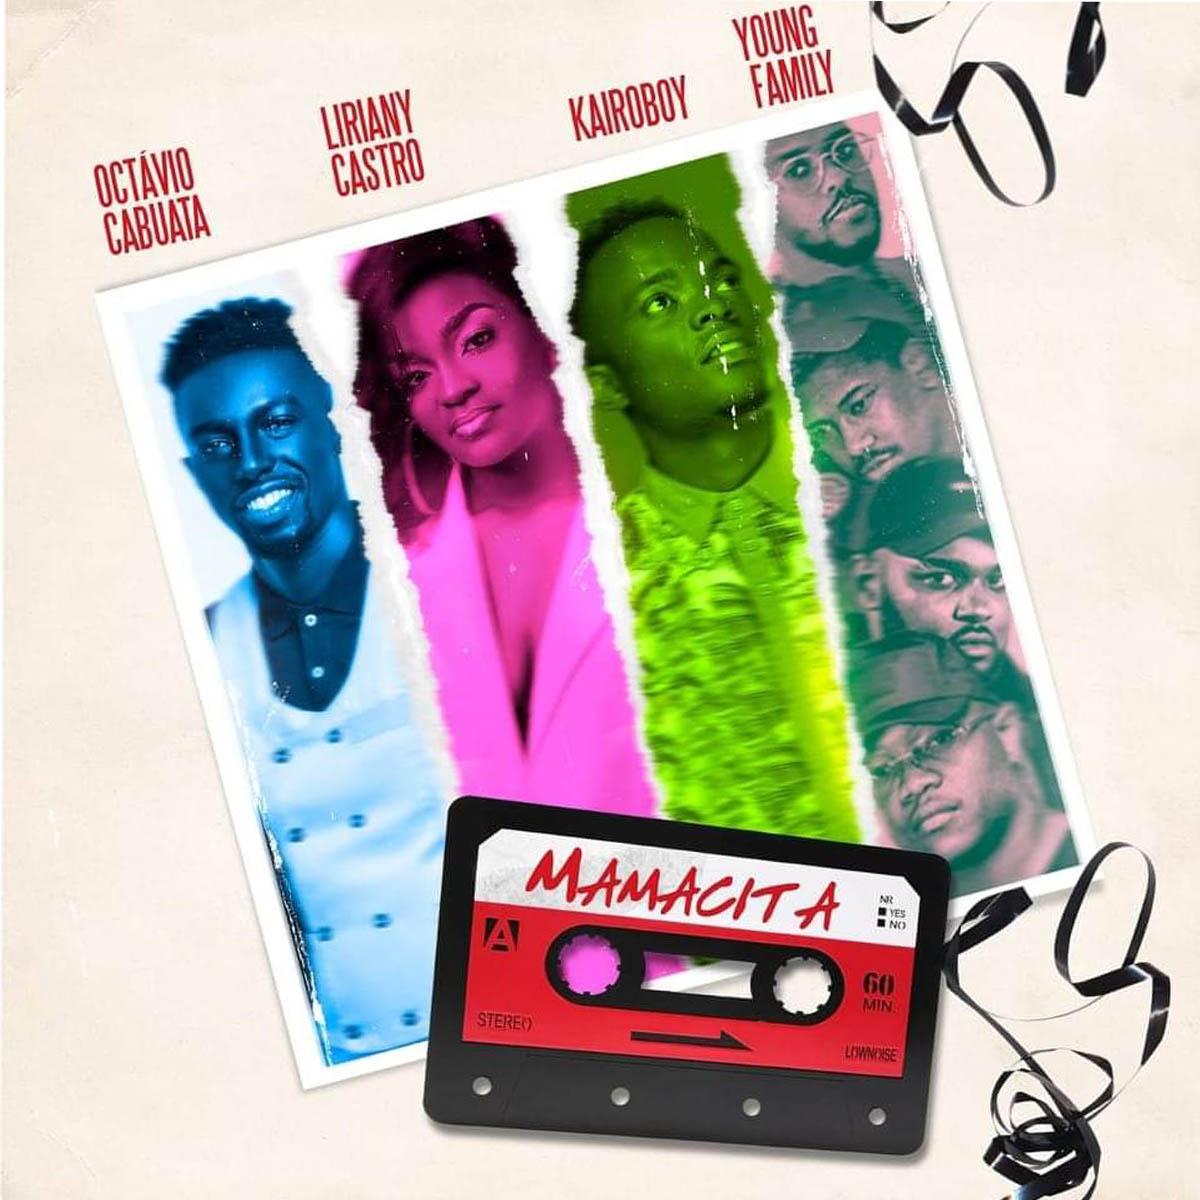 Octávio Cabuata - Mamacita (feat. Young Family, Liriany & Kairoboy)